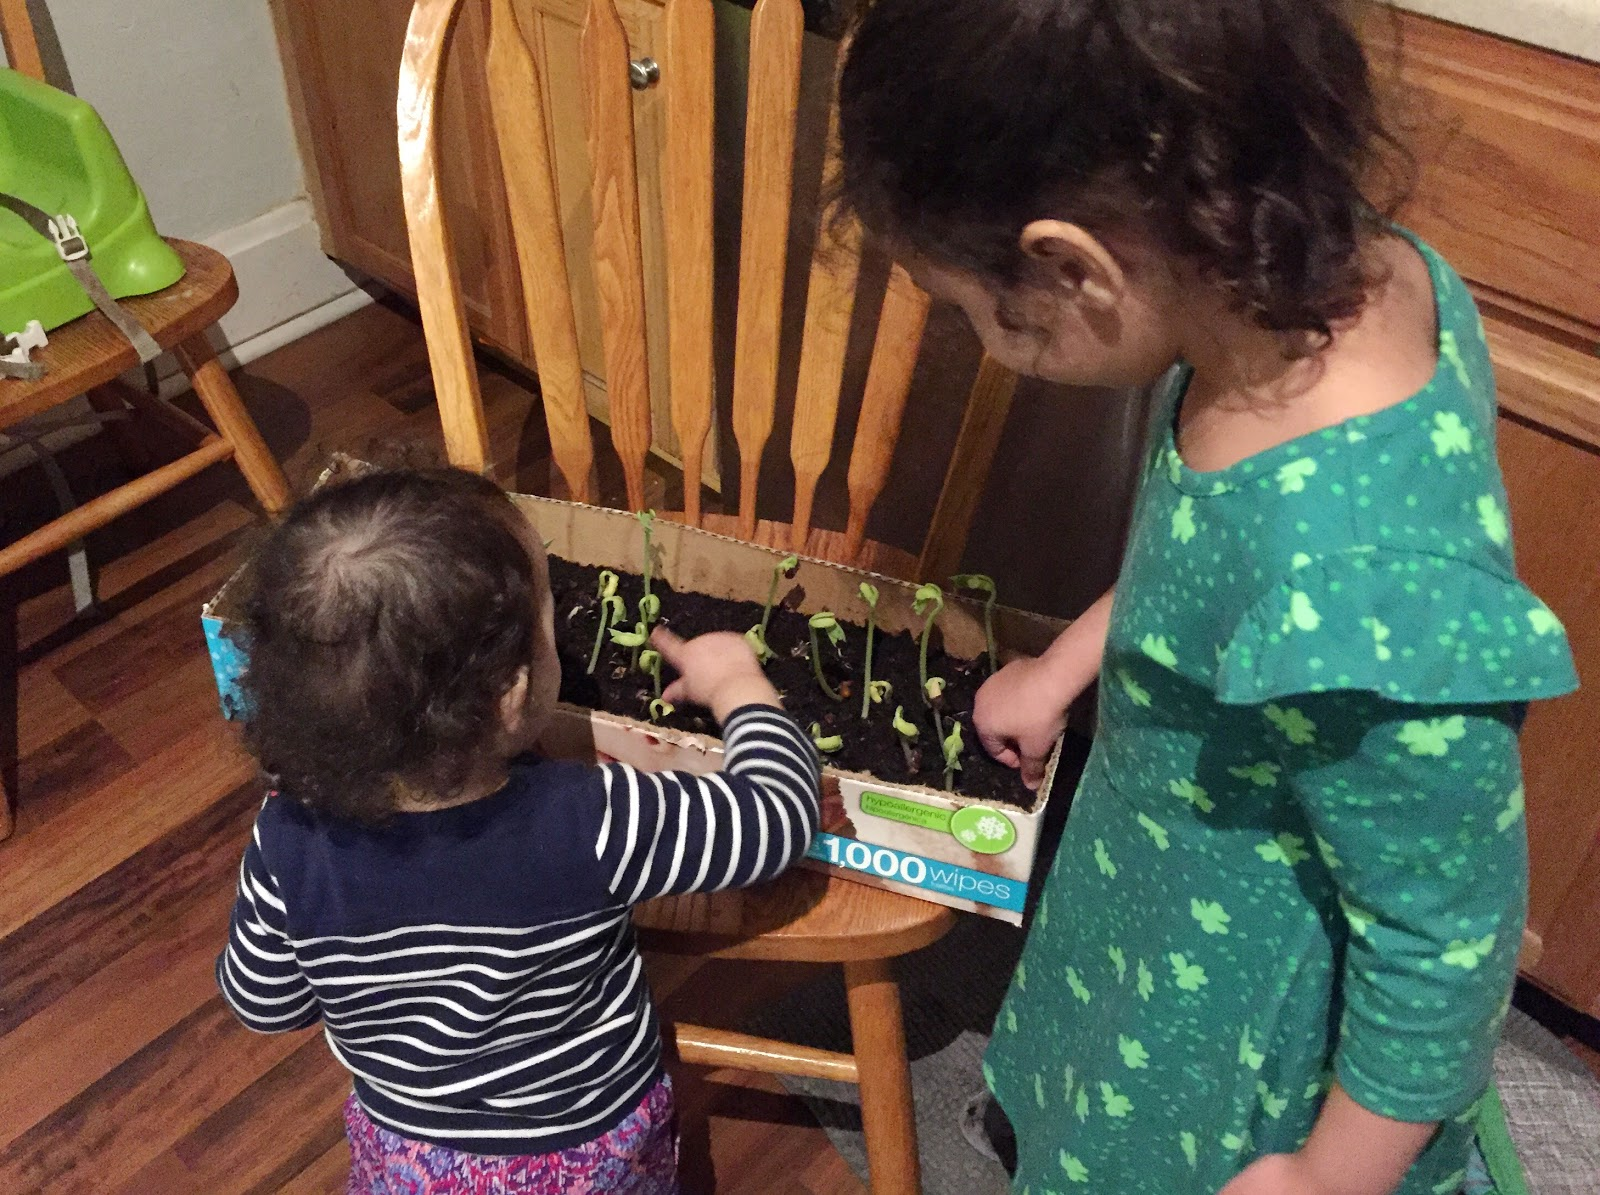 Golden Skies: Vegetable Garden: Getting Things Planted